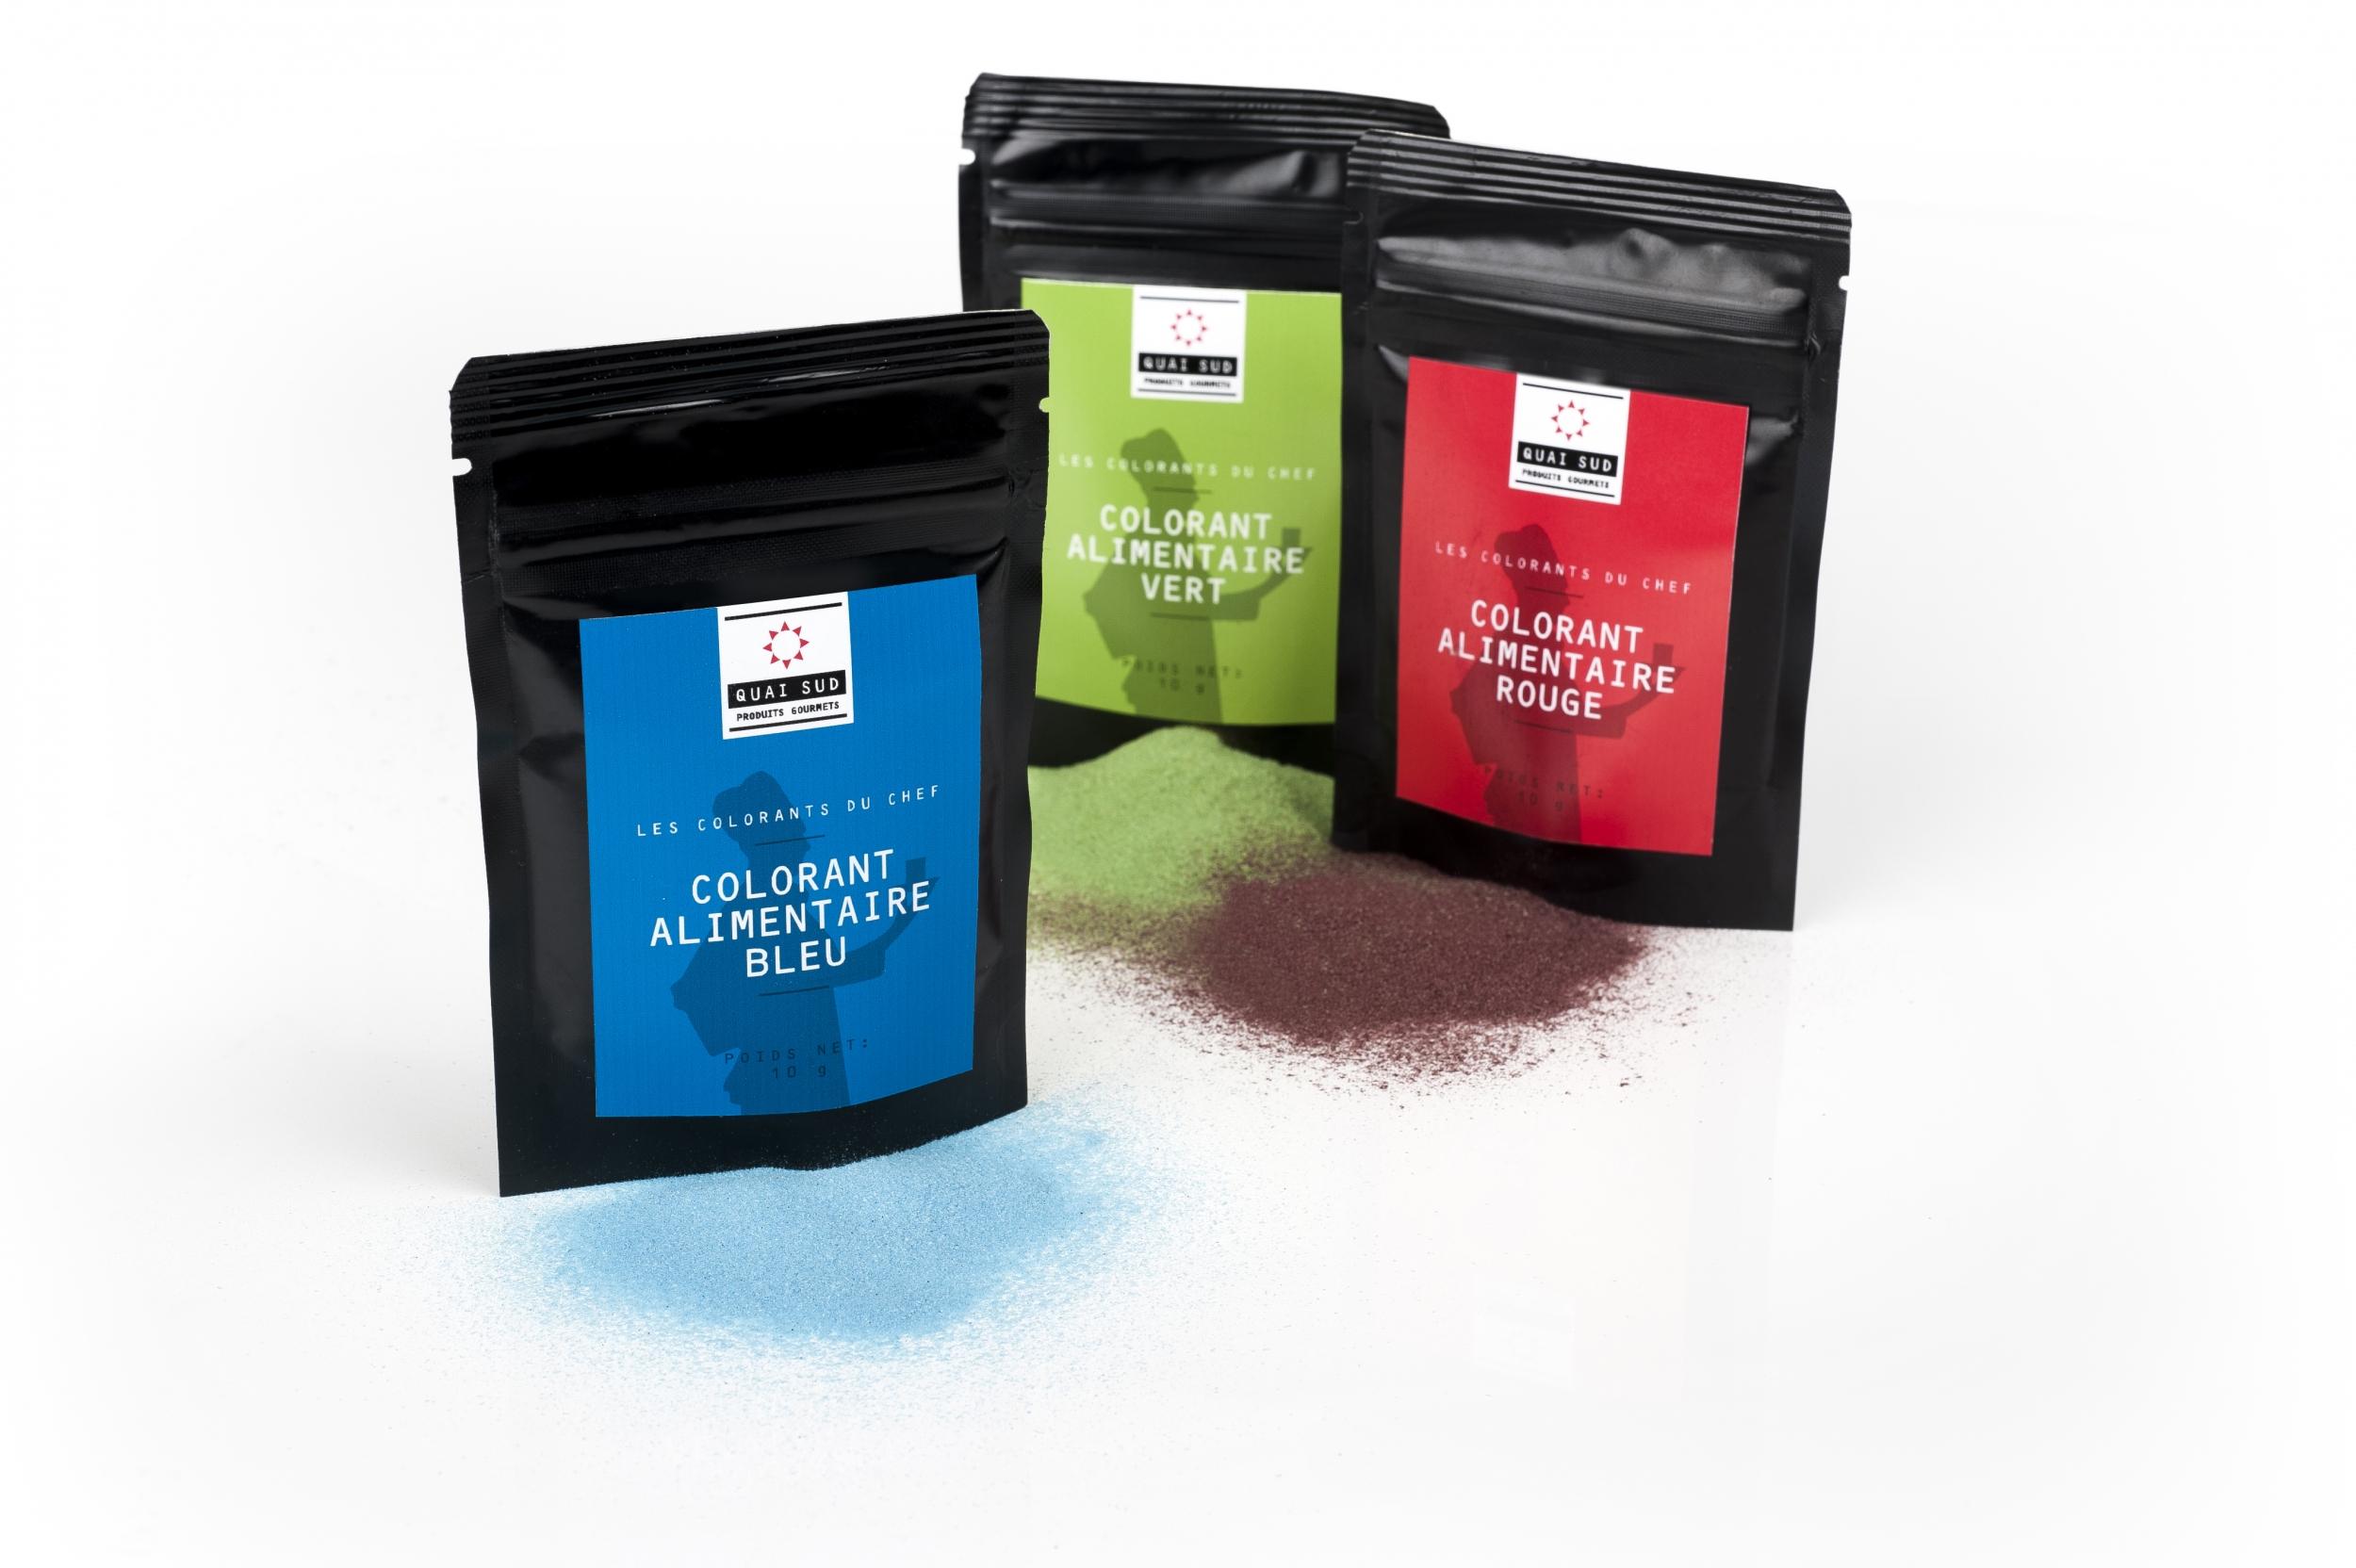 colorant alimentaire poudre pas cher - Colorant Poudre Alimentaire